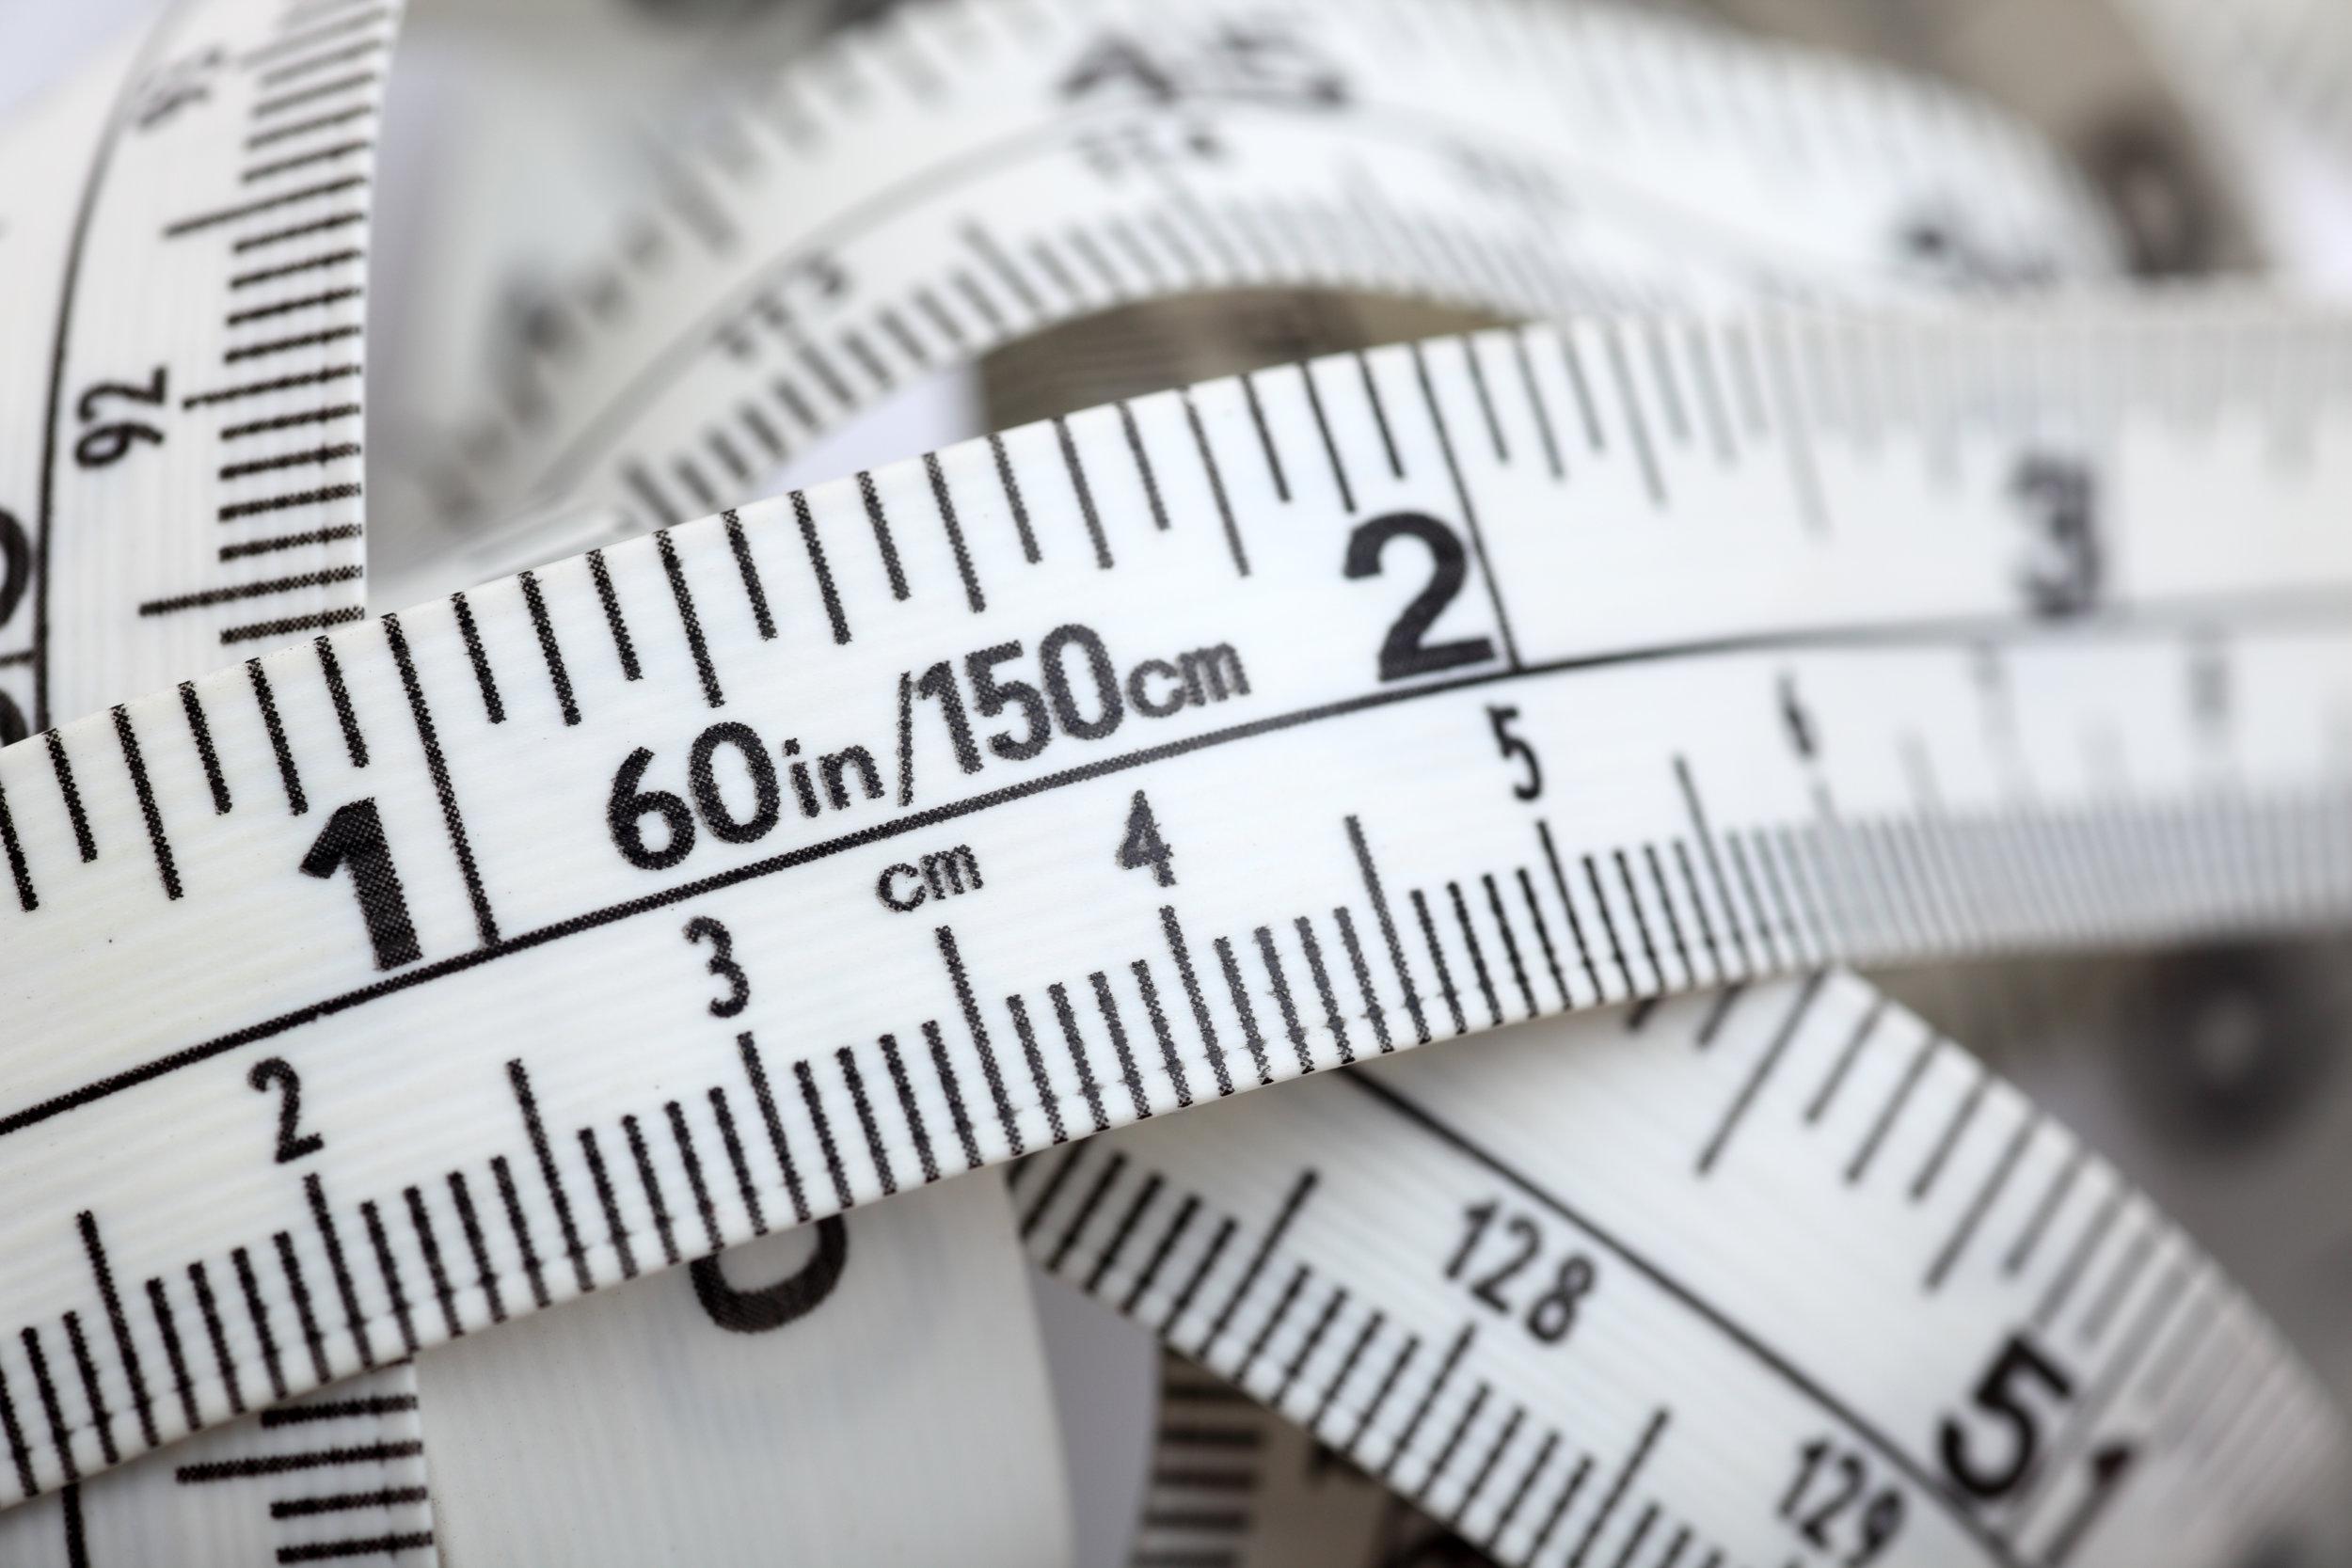 tape-measure-close-up-PPTEWDV.jpg